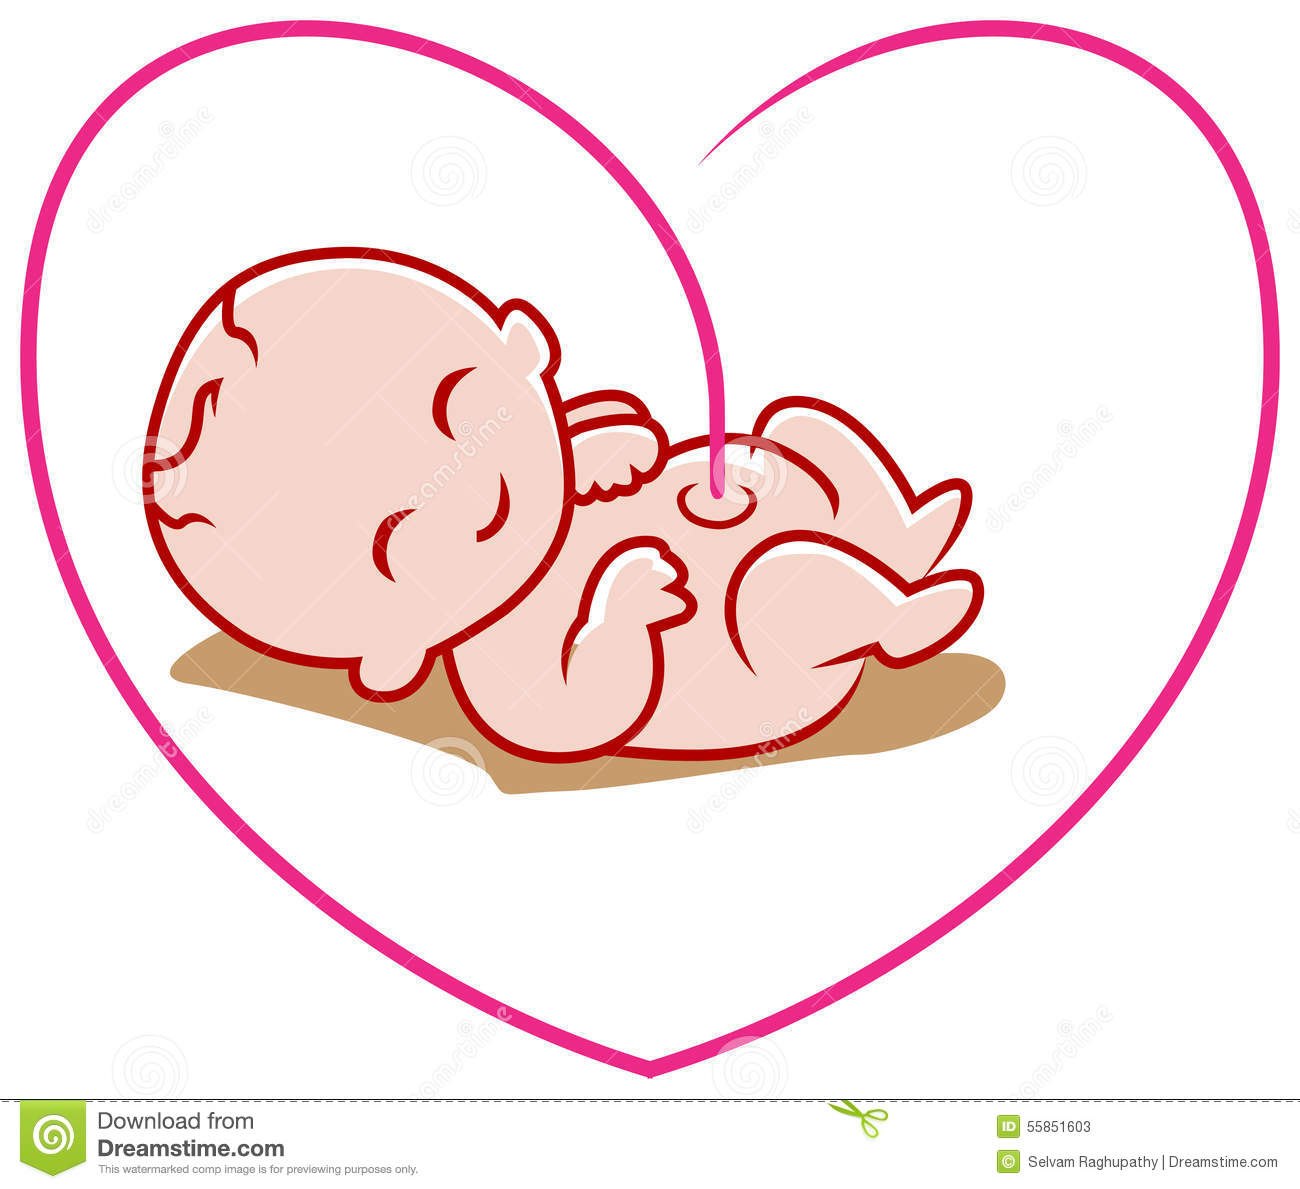 Babies clipart newborn. New baby cilpart lofty